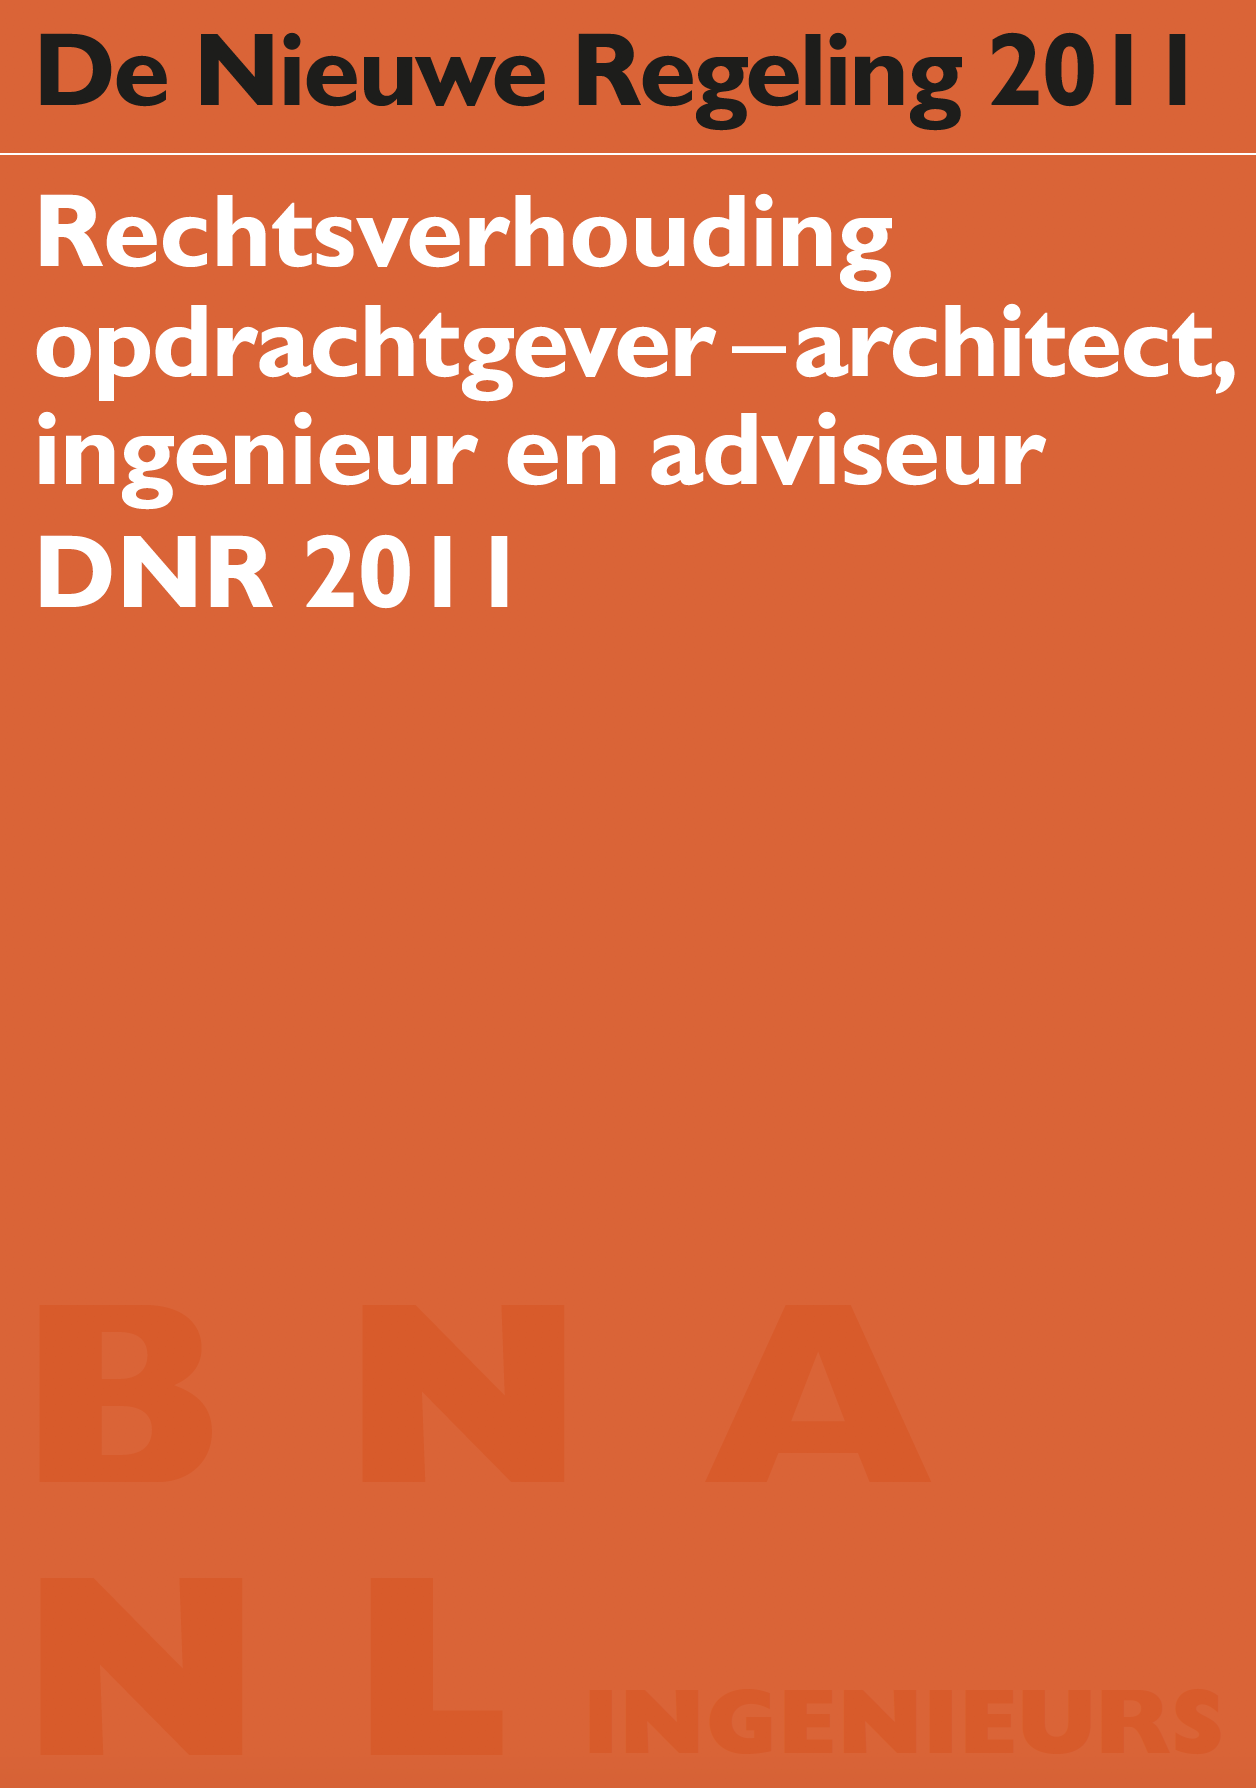 DNR2011